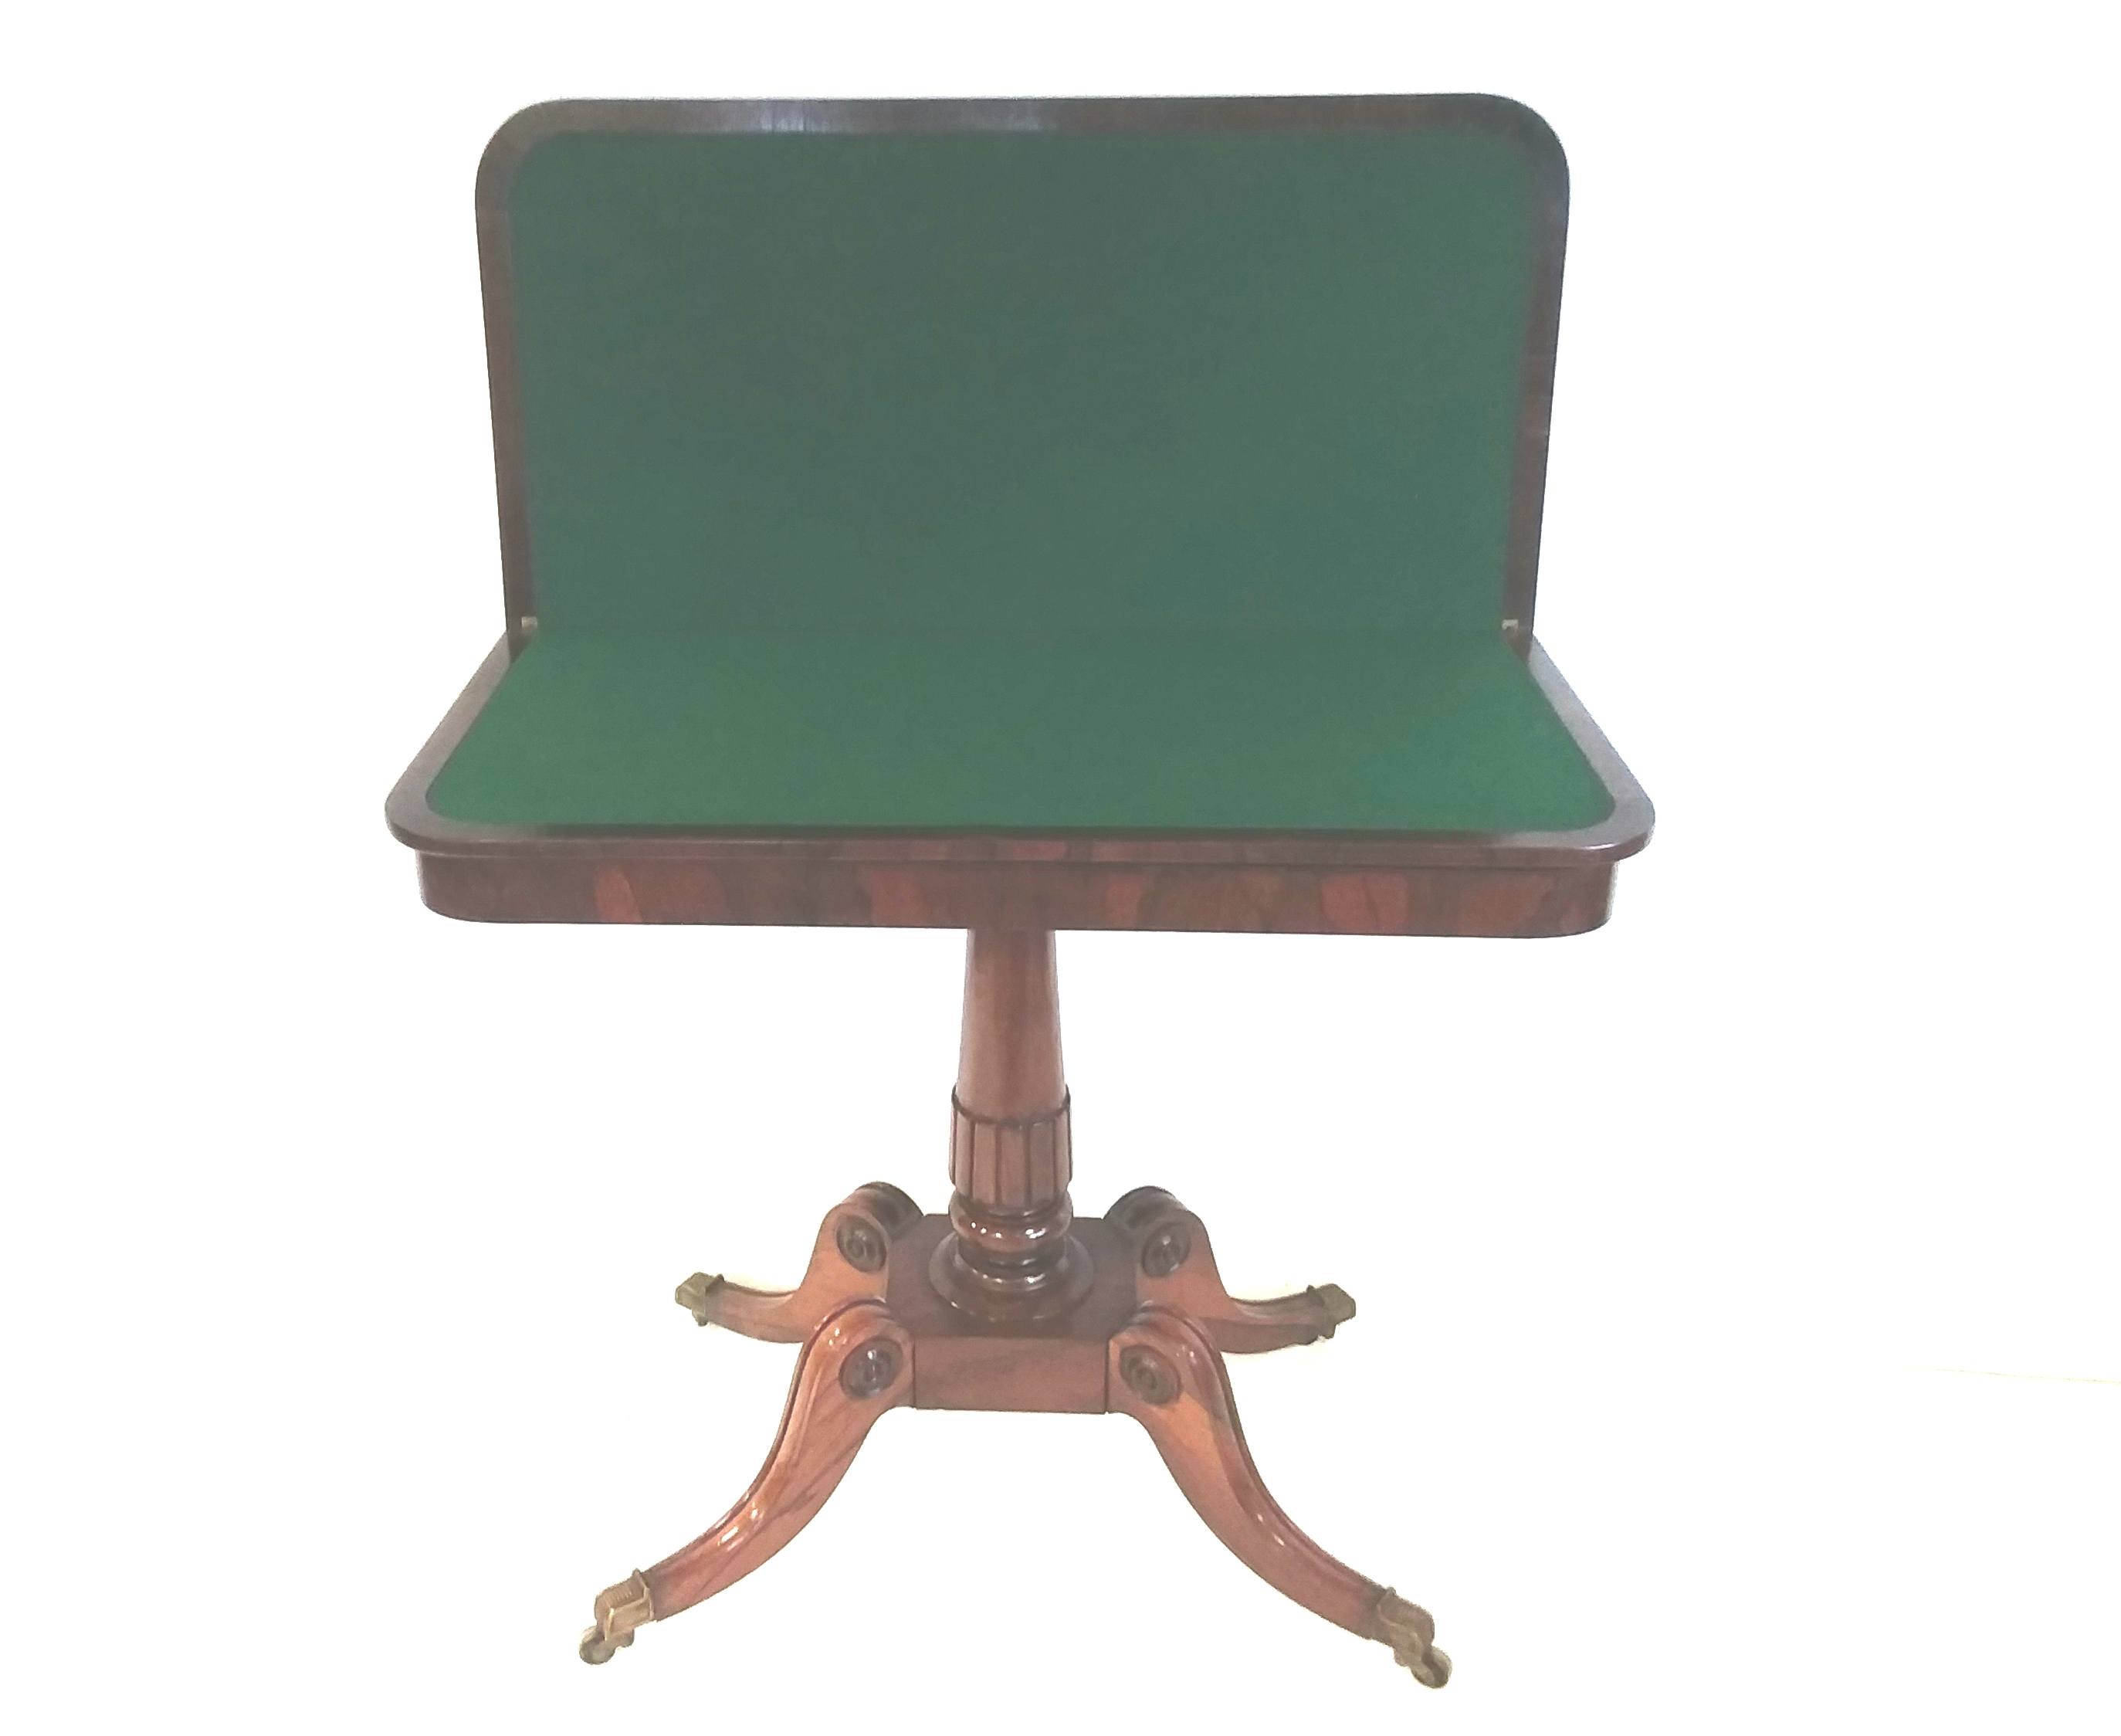 Antique Regency Rosewood Foldover Games Table